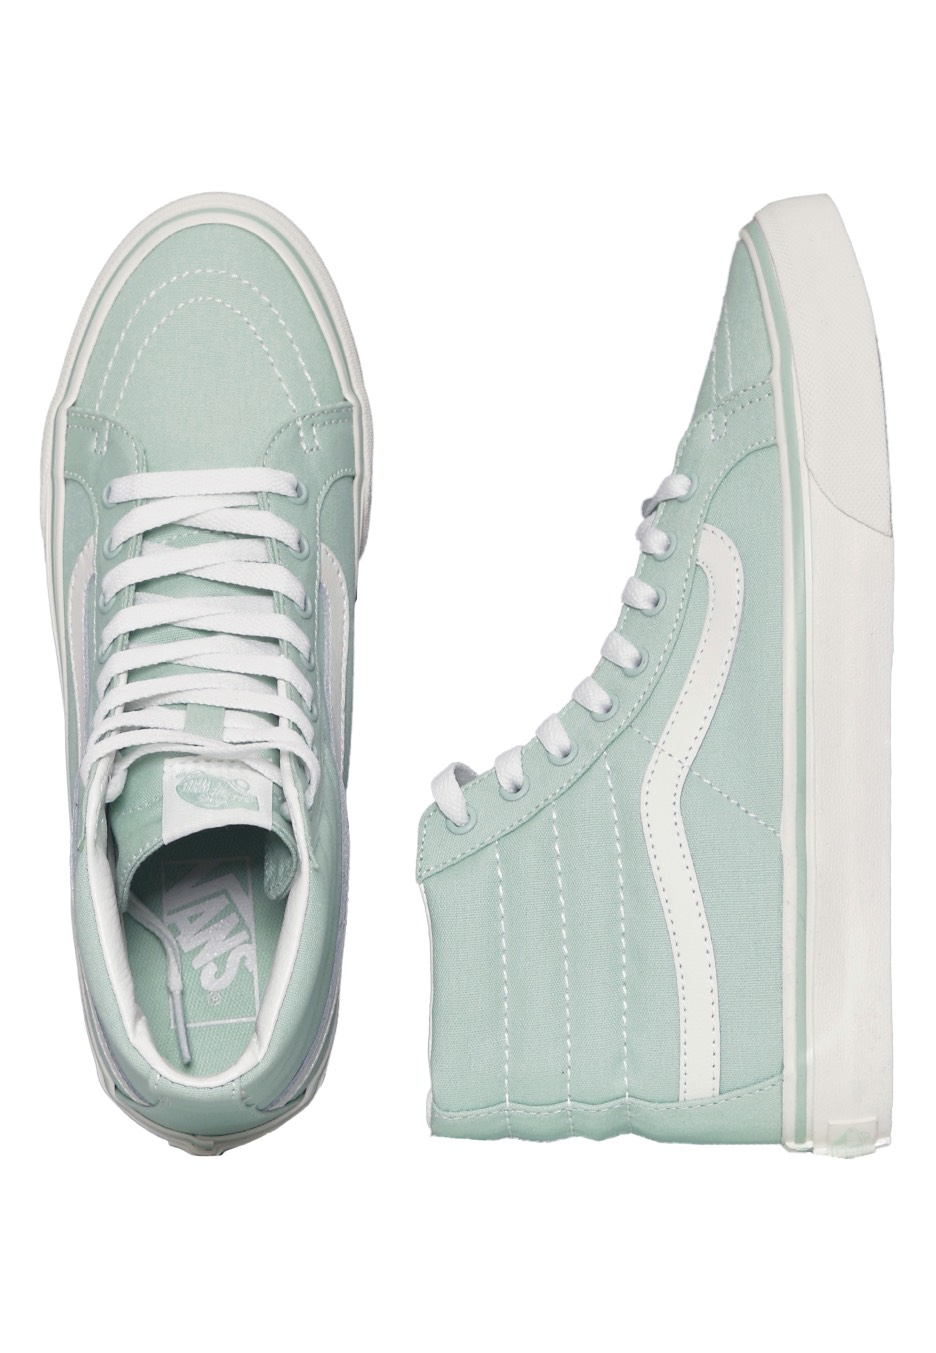 51e5d4cce6 Vans - Sk8-Hi Slim Gossamer Green Blanc De Blanc - Girl Shoes -  Impericon.com Worldwide